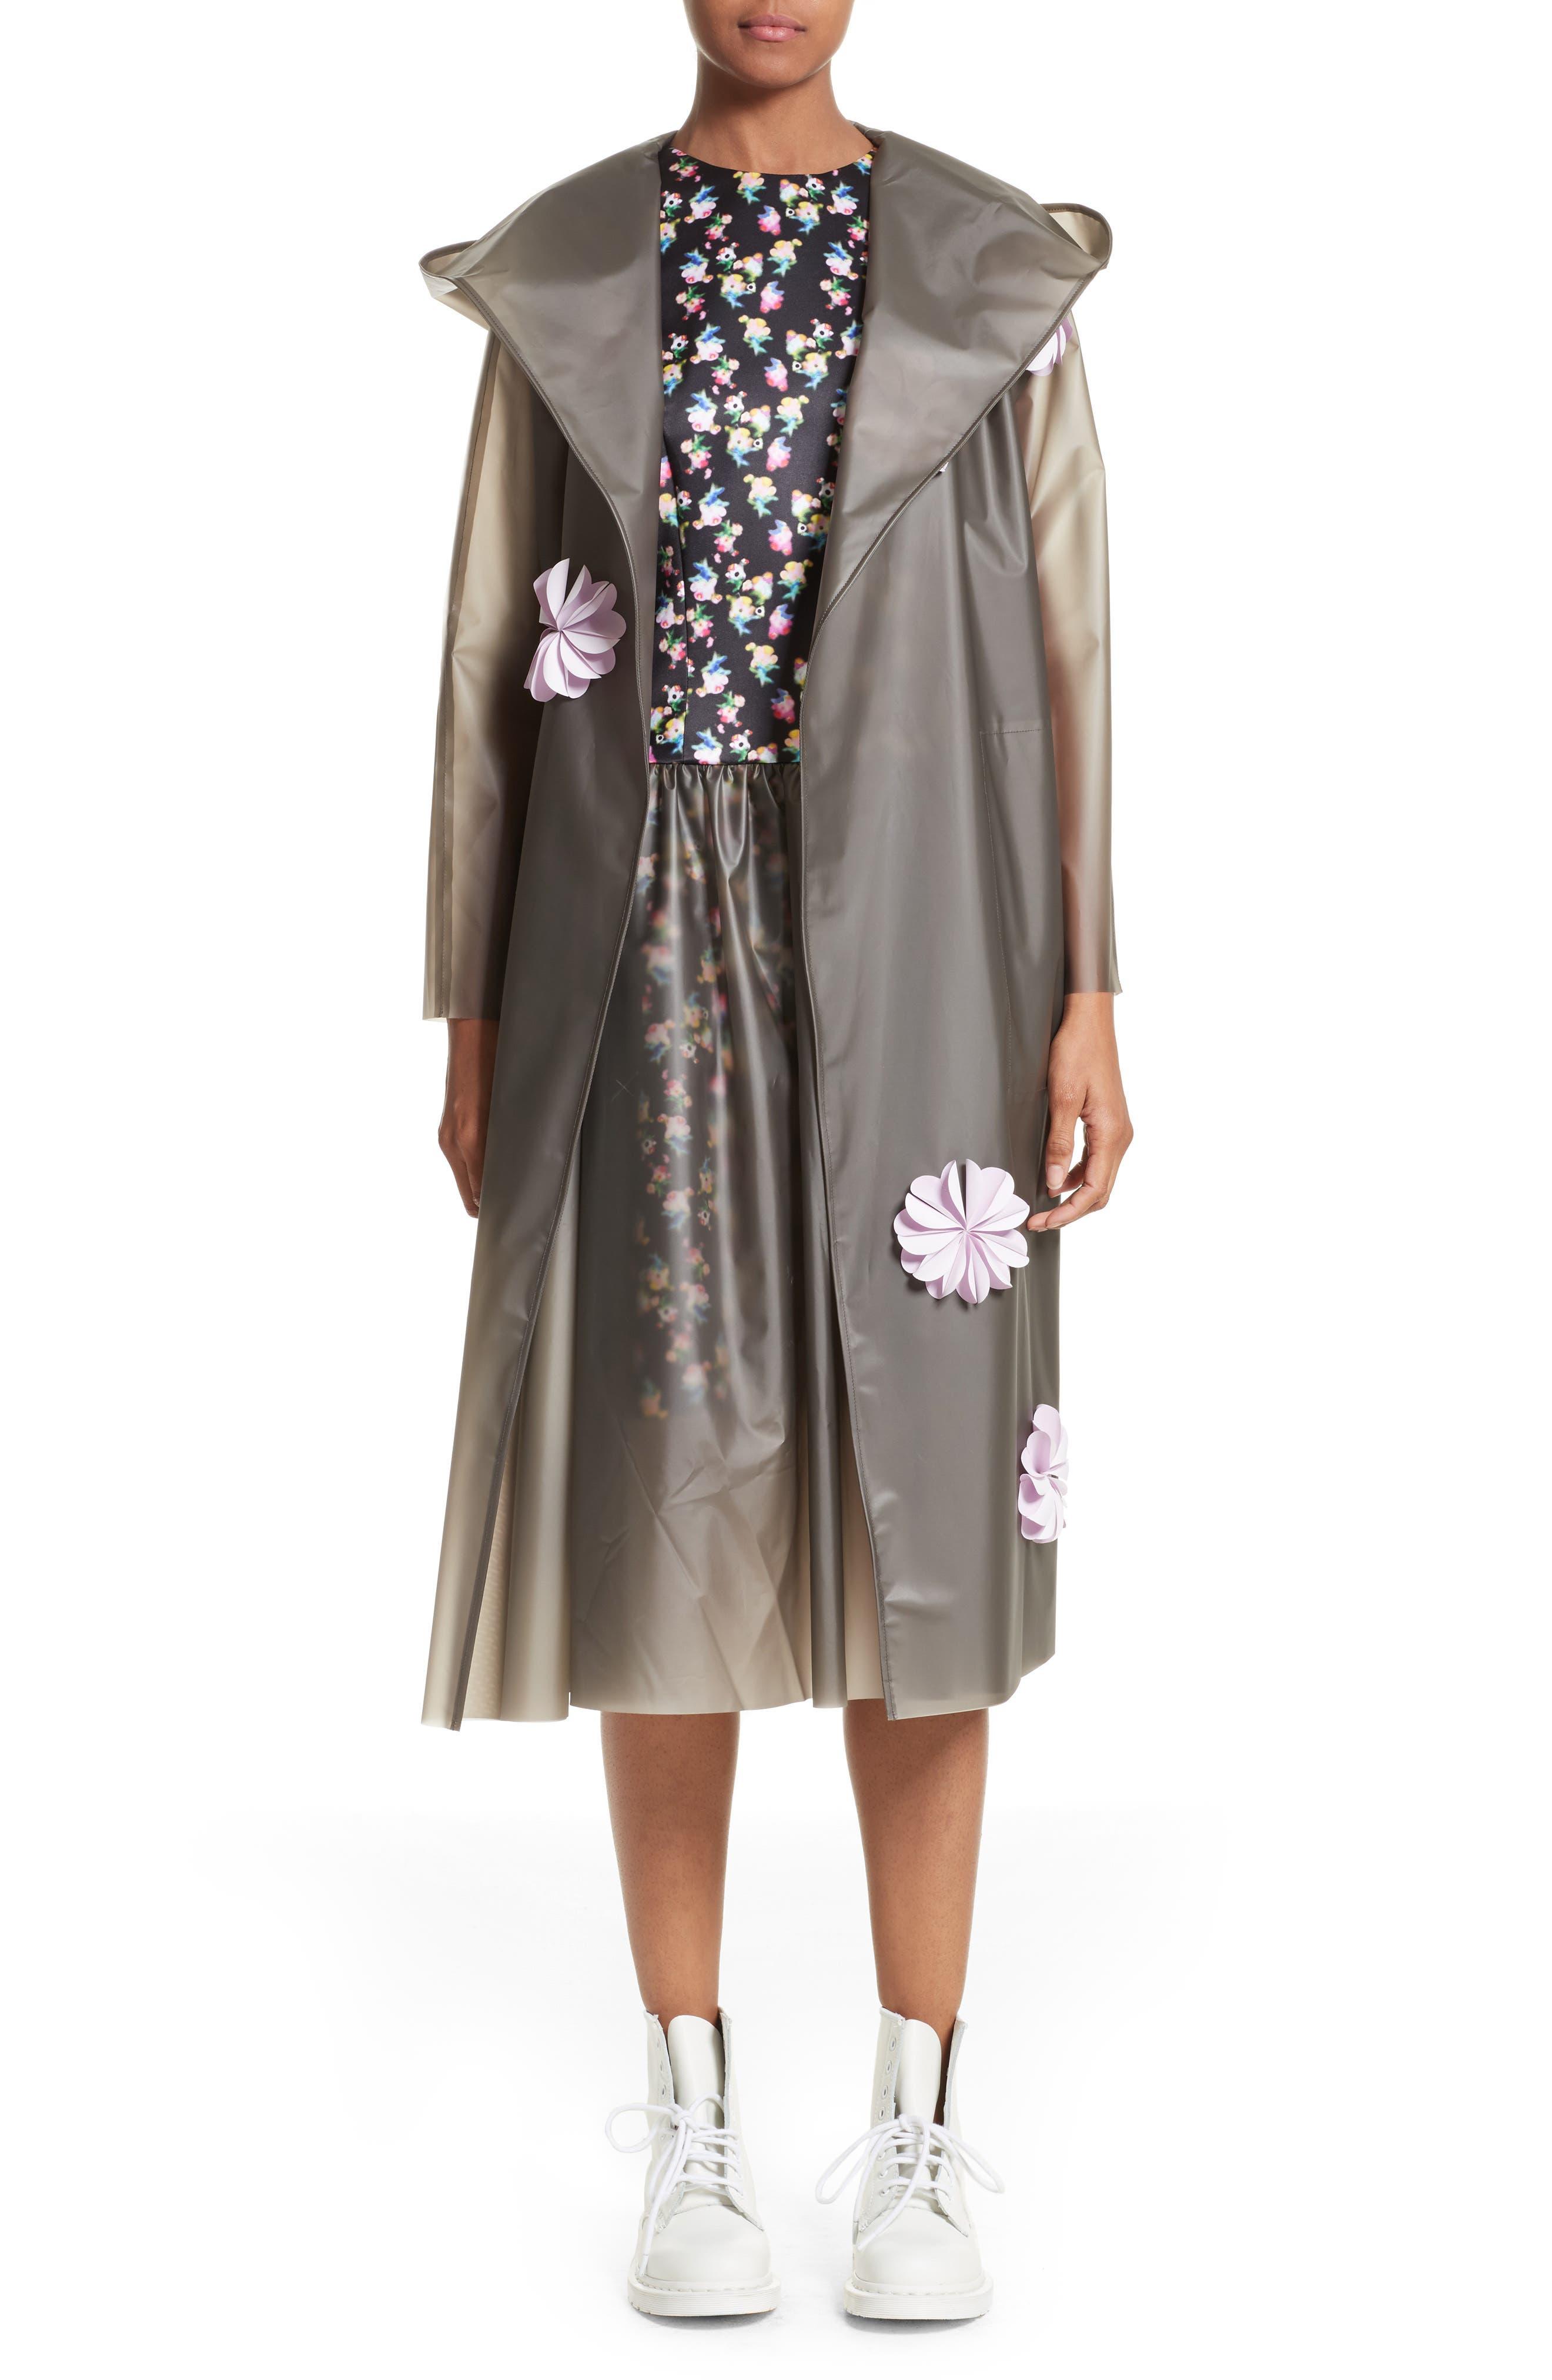 PASKAL Reflective Flower Trim Vinyl Raincoat